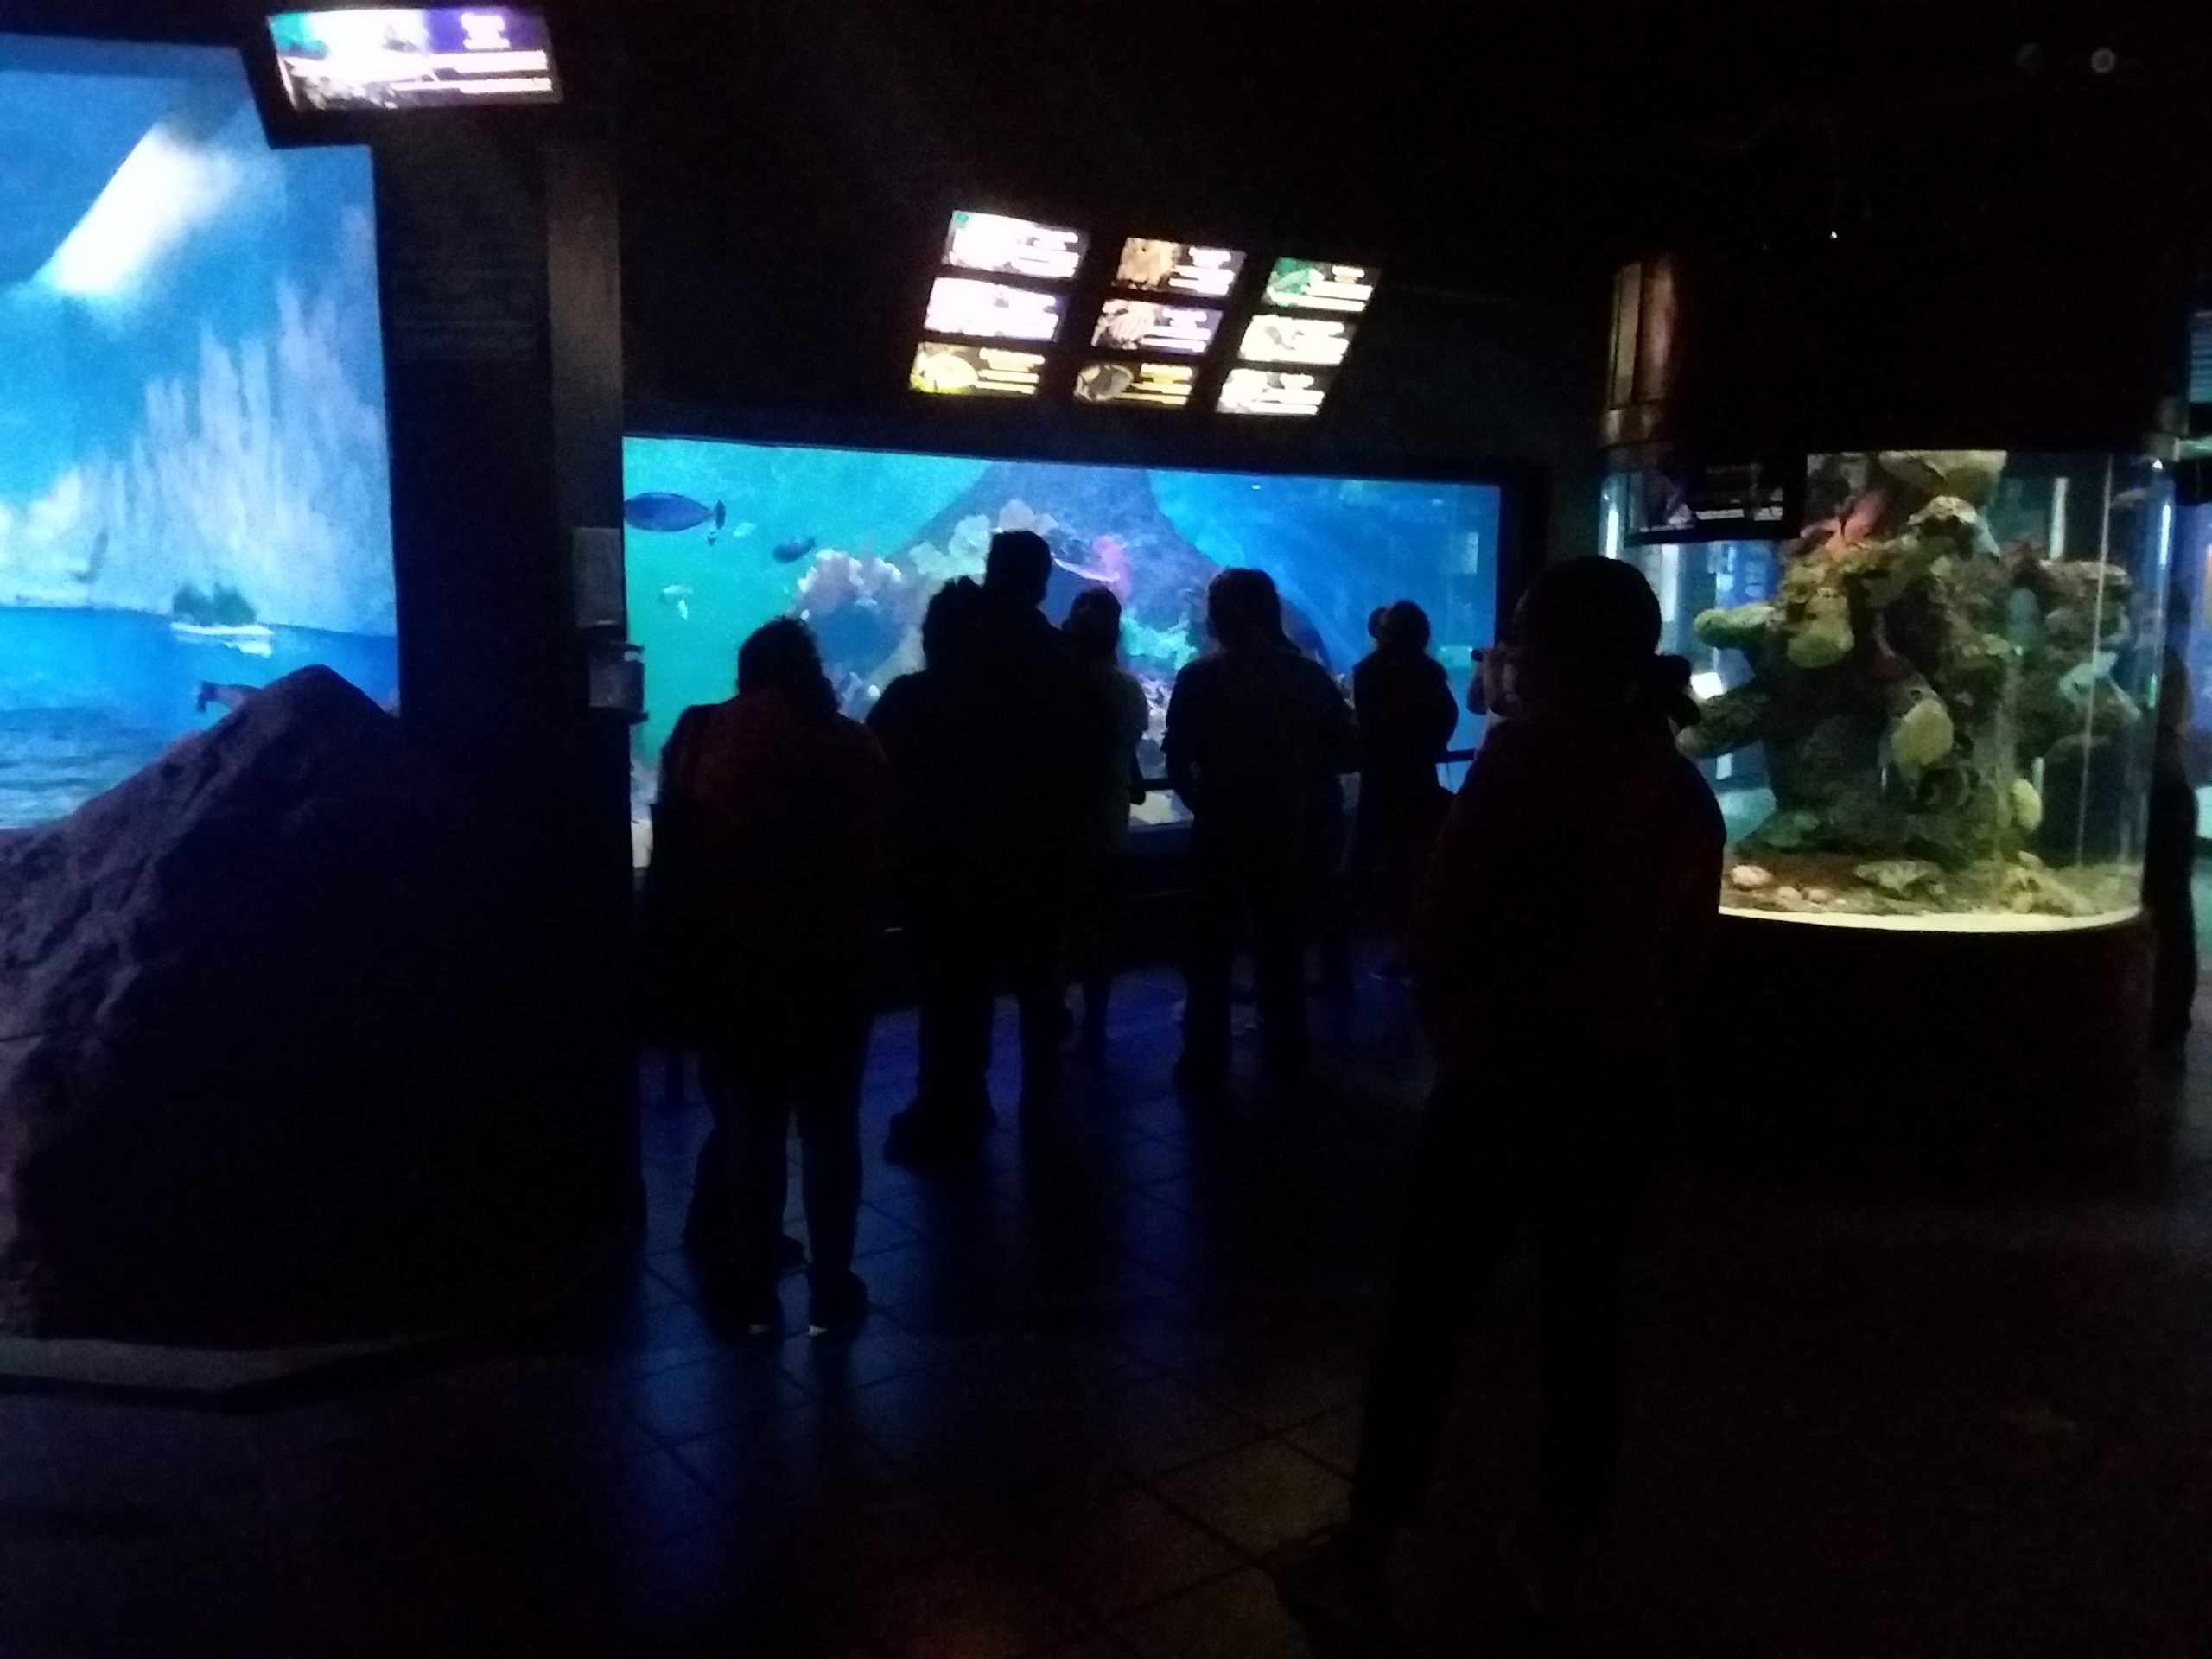 Aquarium de veracruz